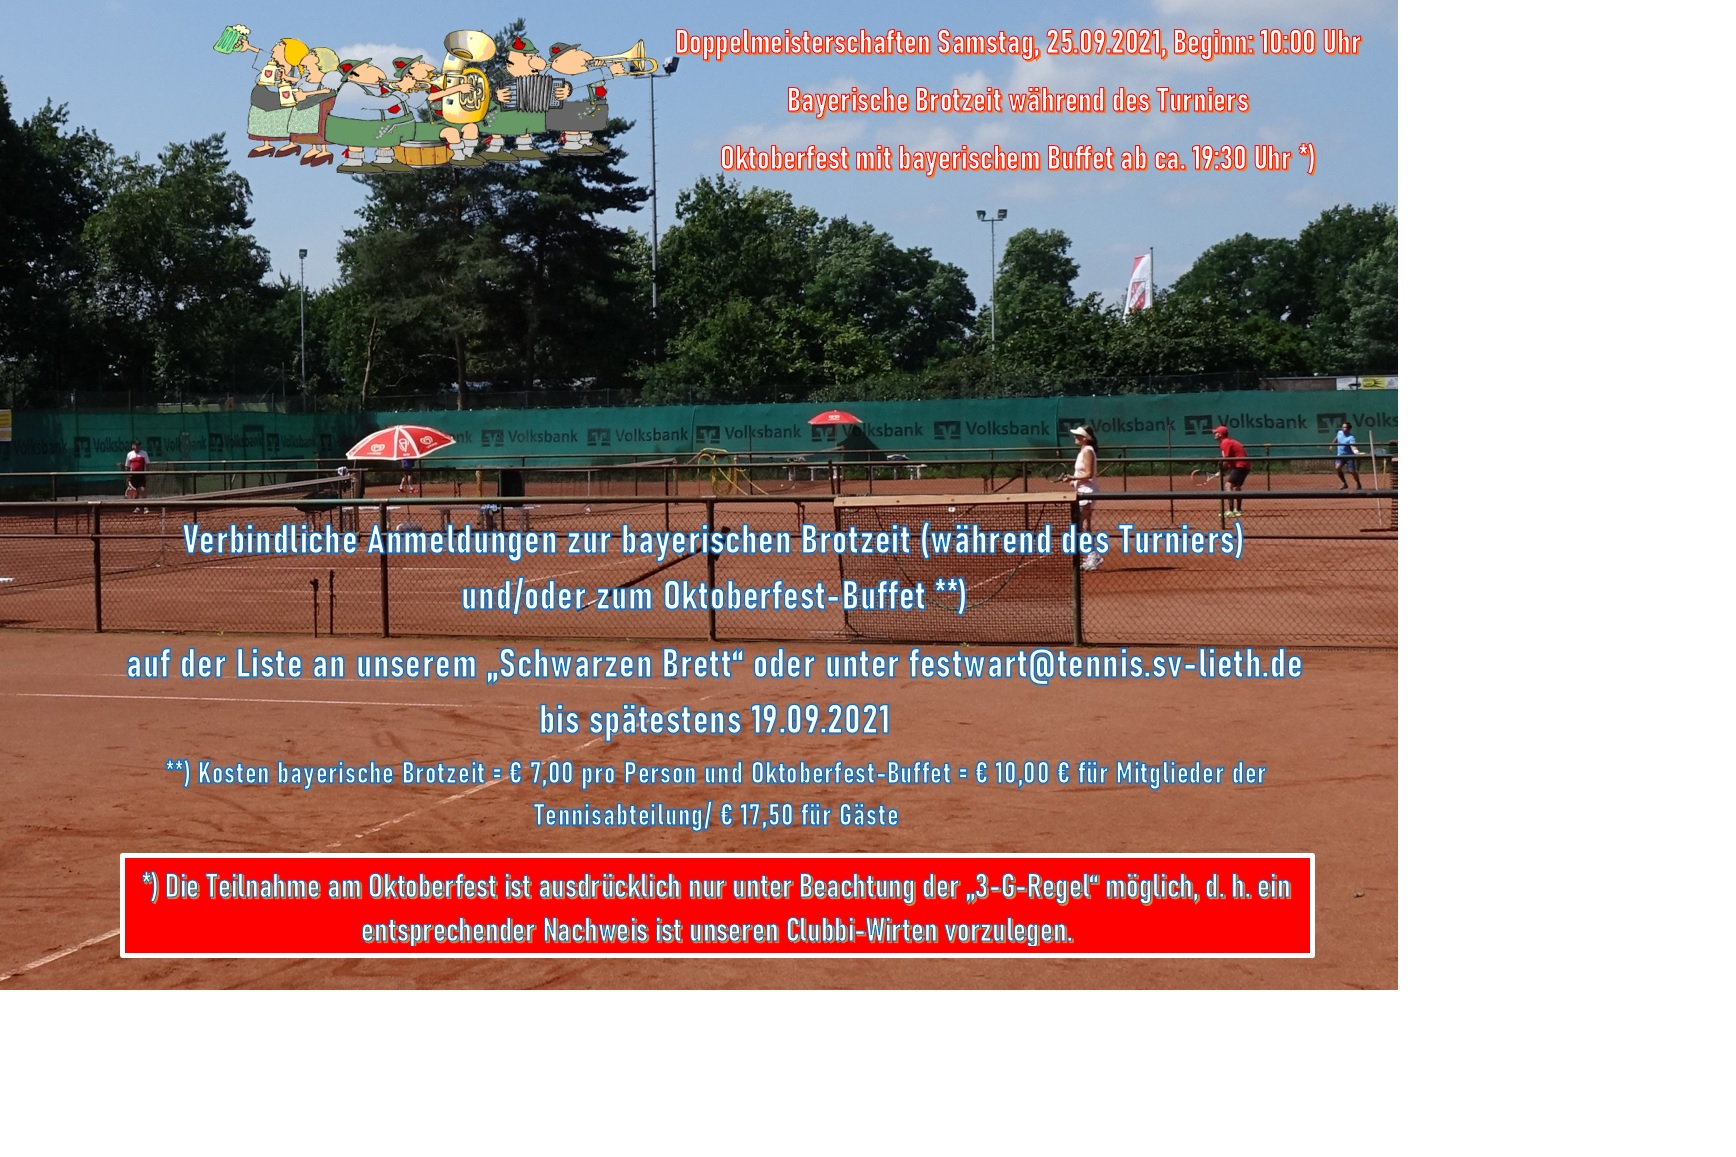 Doppelmeisterschaften und Oktoberfest am 25.09.2021